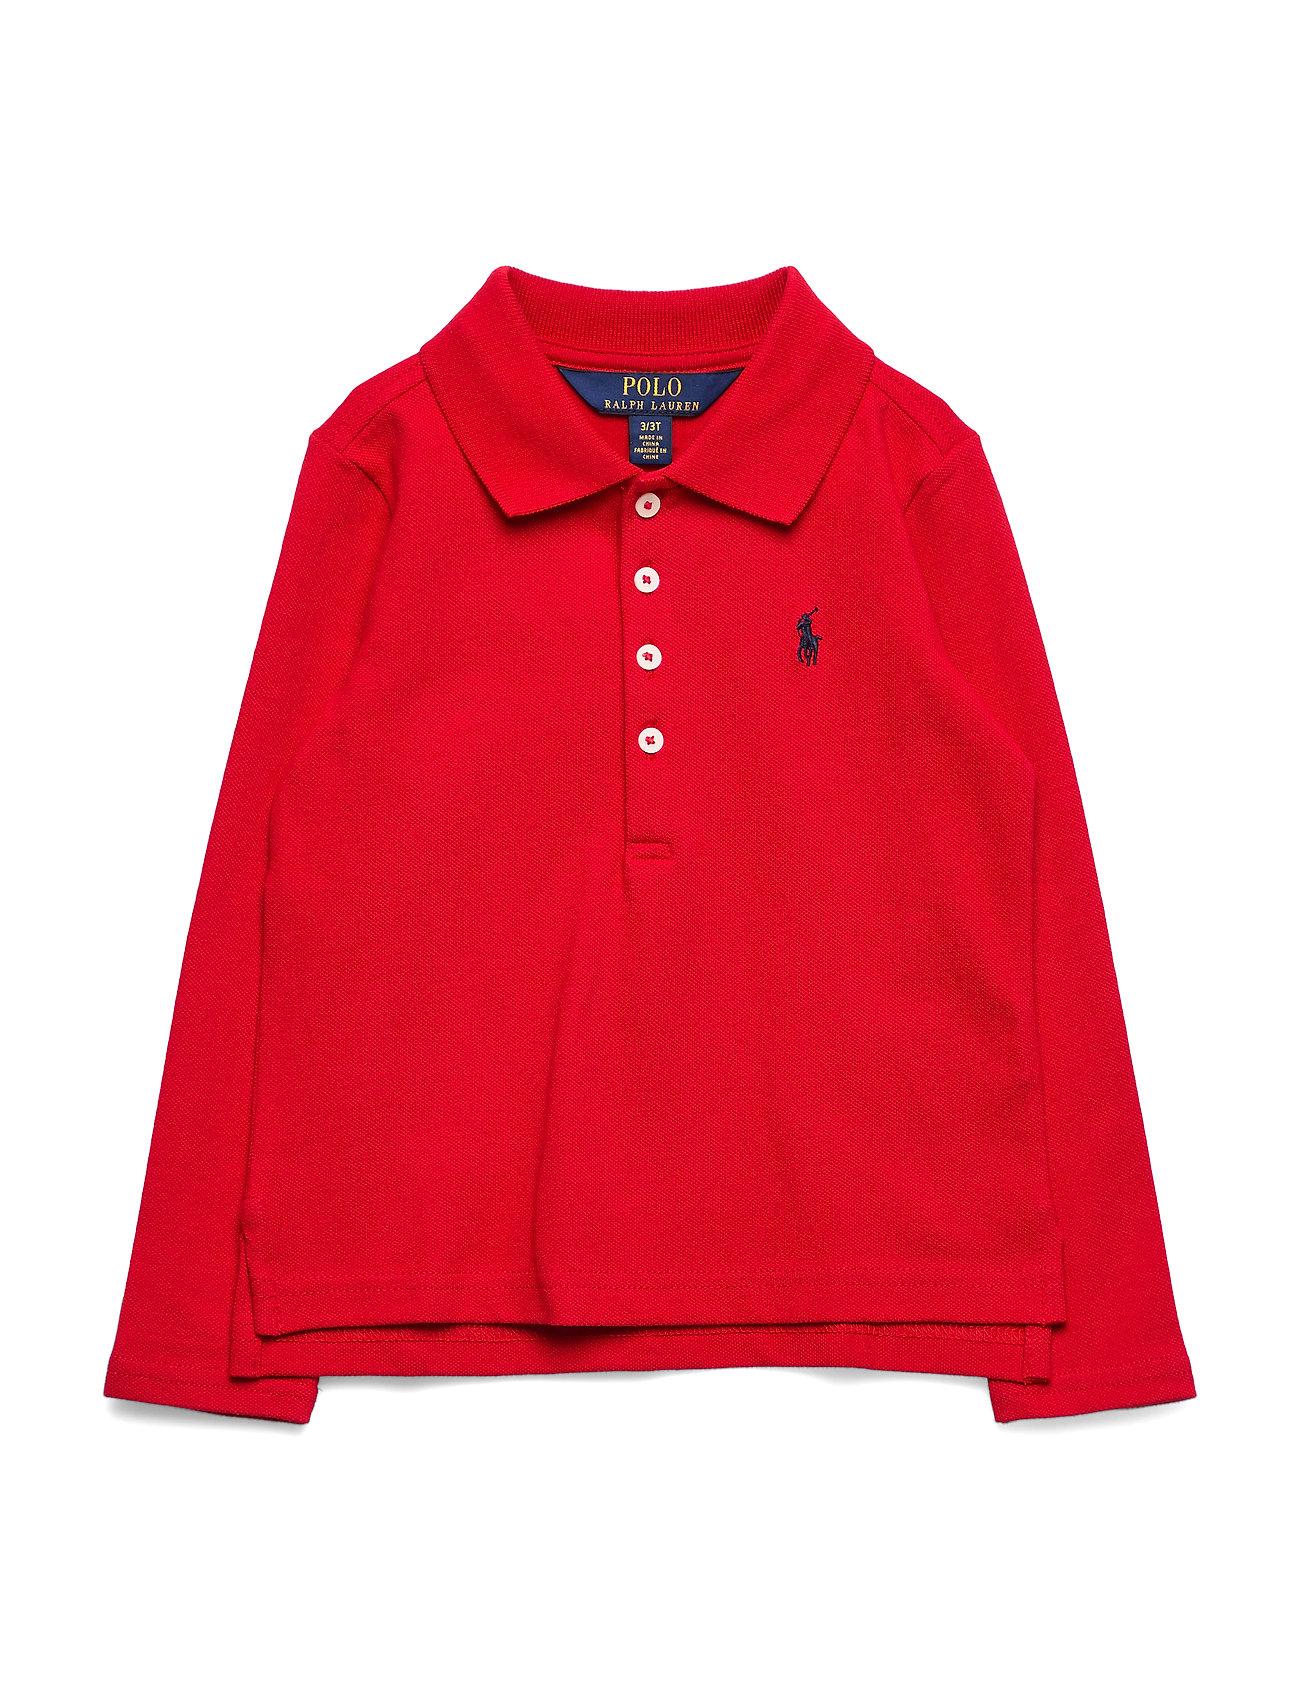 Ralph Lauren Kids Stretch Cotton Mesh Polo Shirt - RL 2000 RED